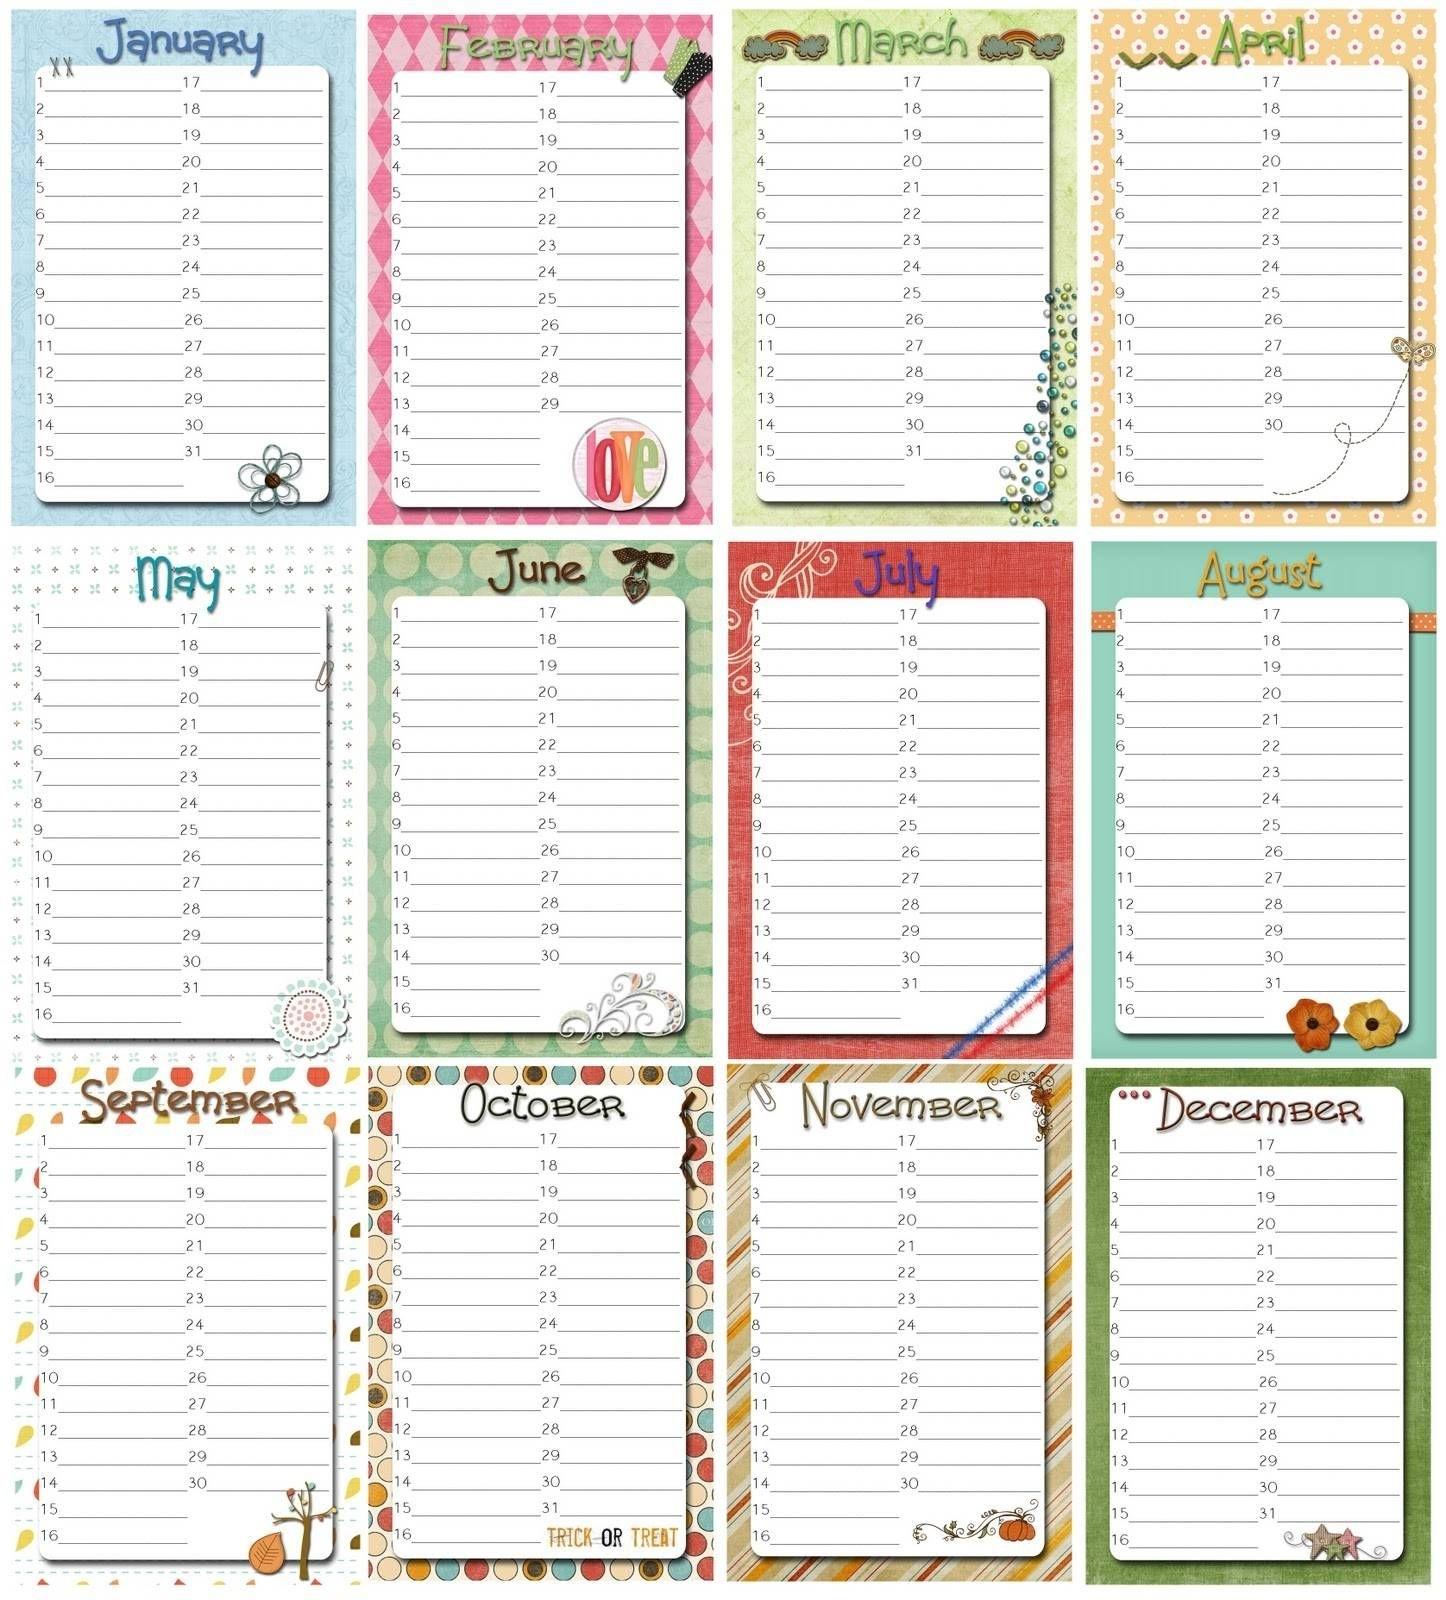 Free Perpetual Calendar Template   Posts Related To inside Free Printable Perpetual Calendar Template